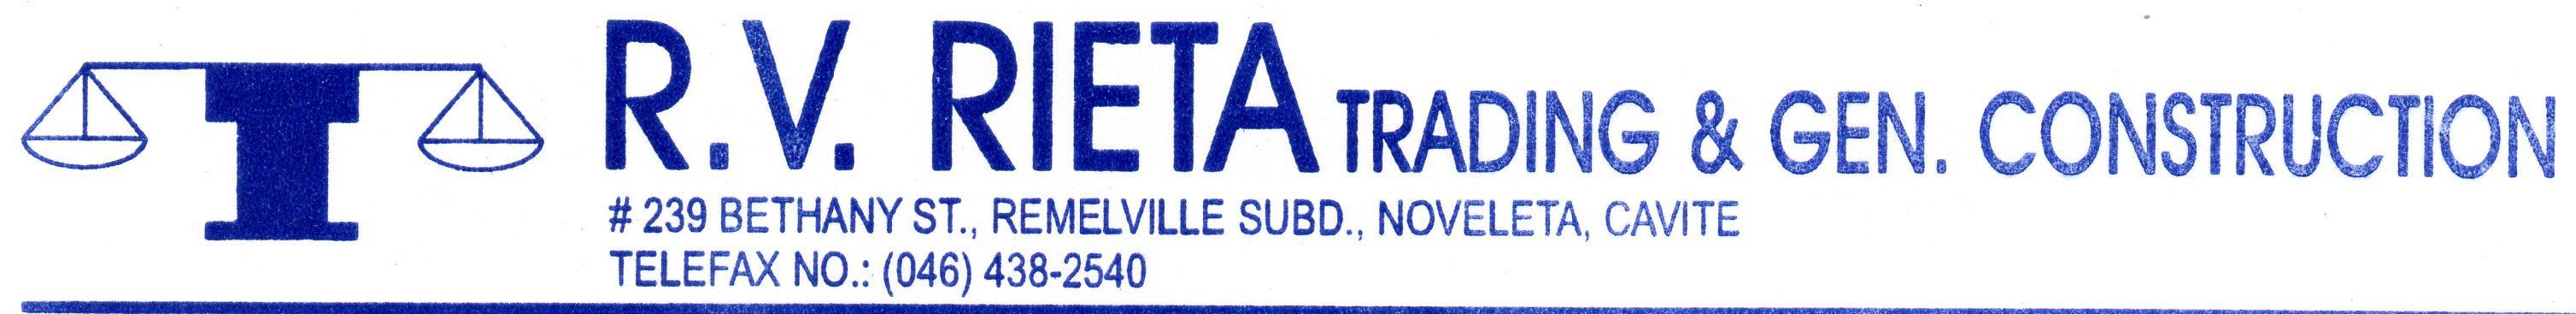 RV Rieta Trading & General Construction